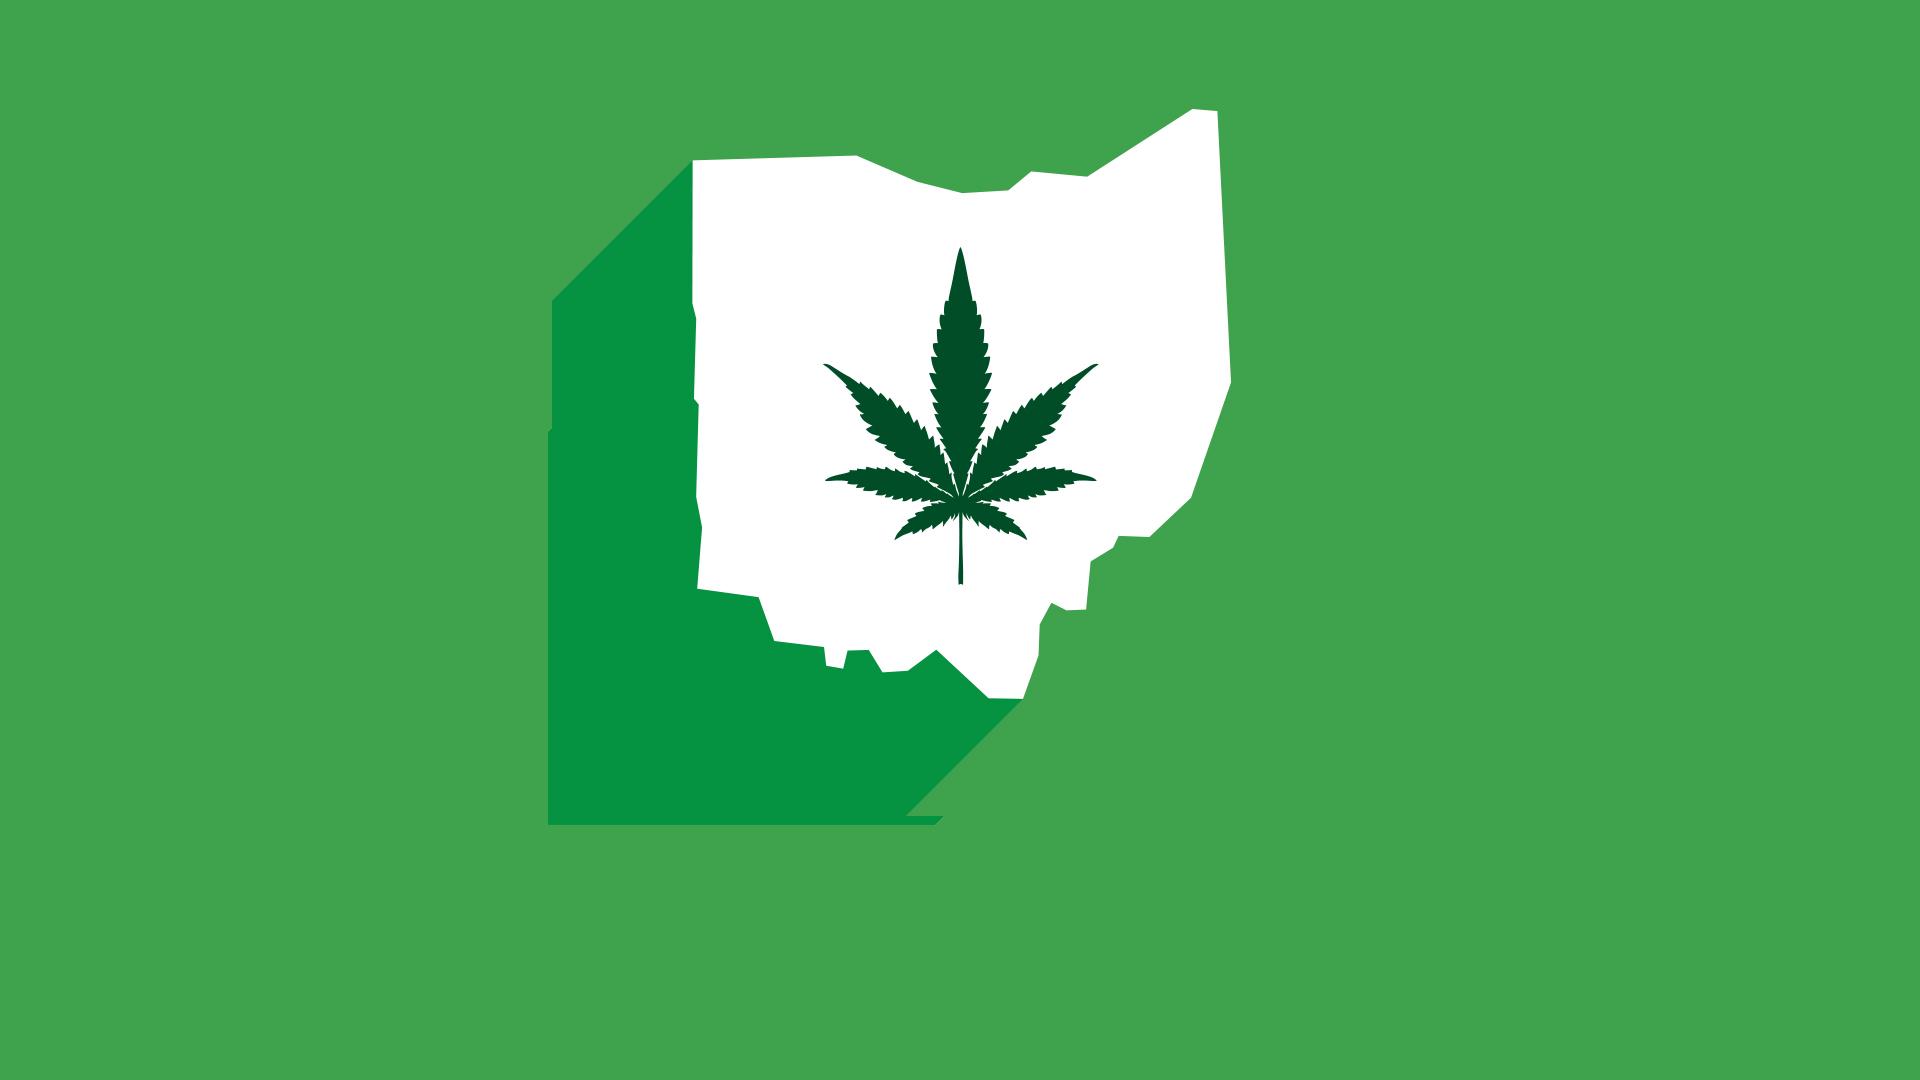 ohio cannabis laws 2021